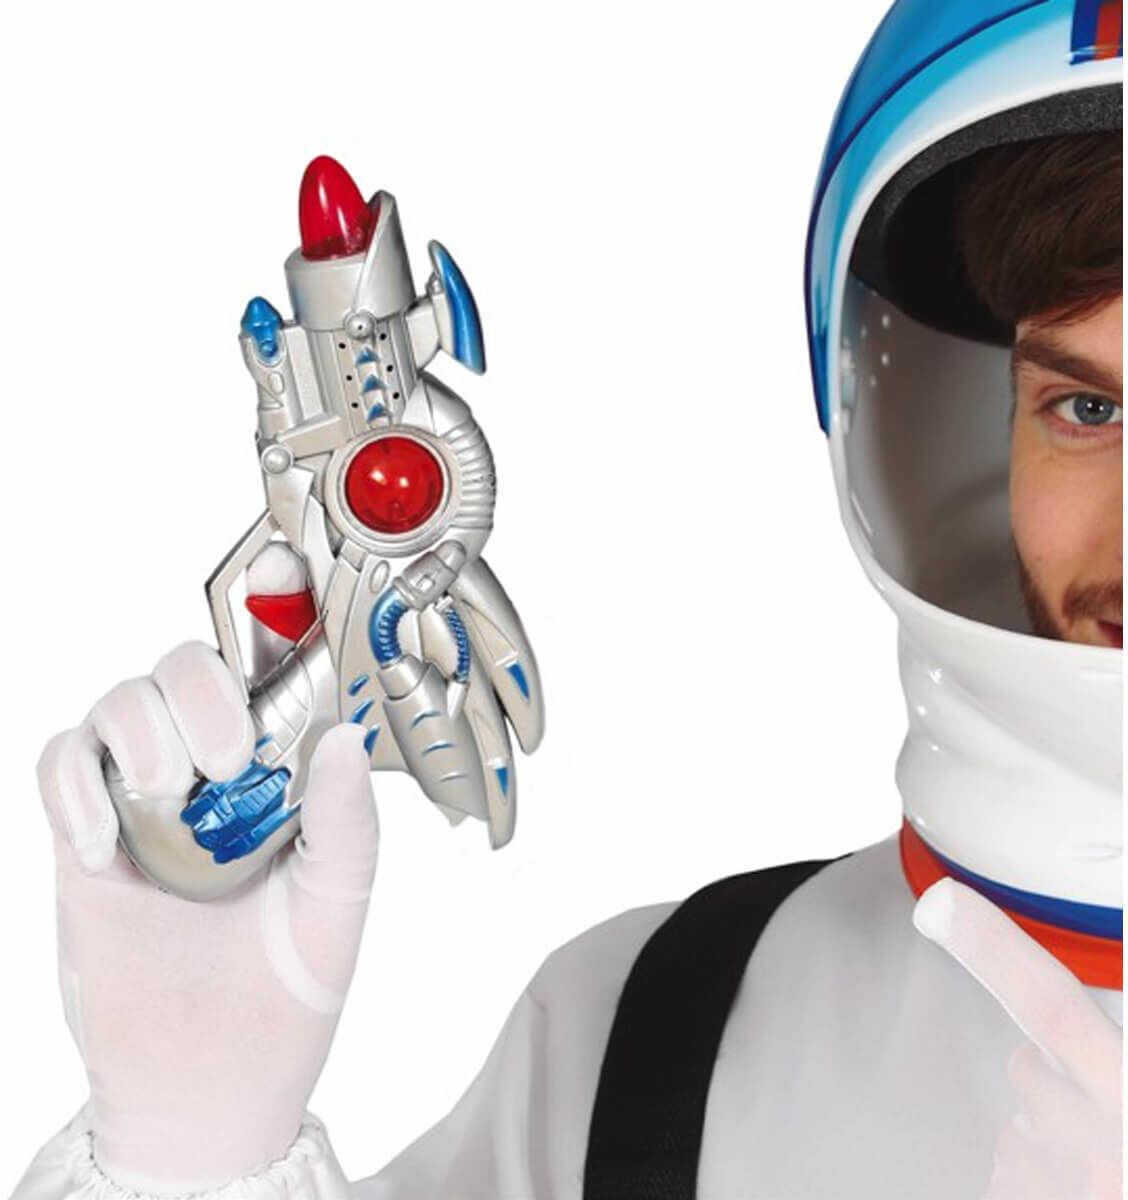 Pistolet kosmiczny - 22 cm - 1 szt.